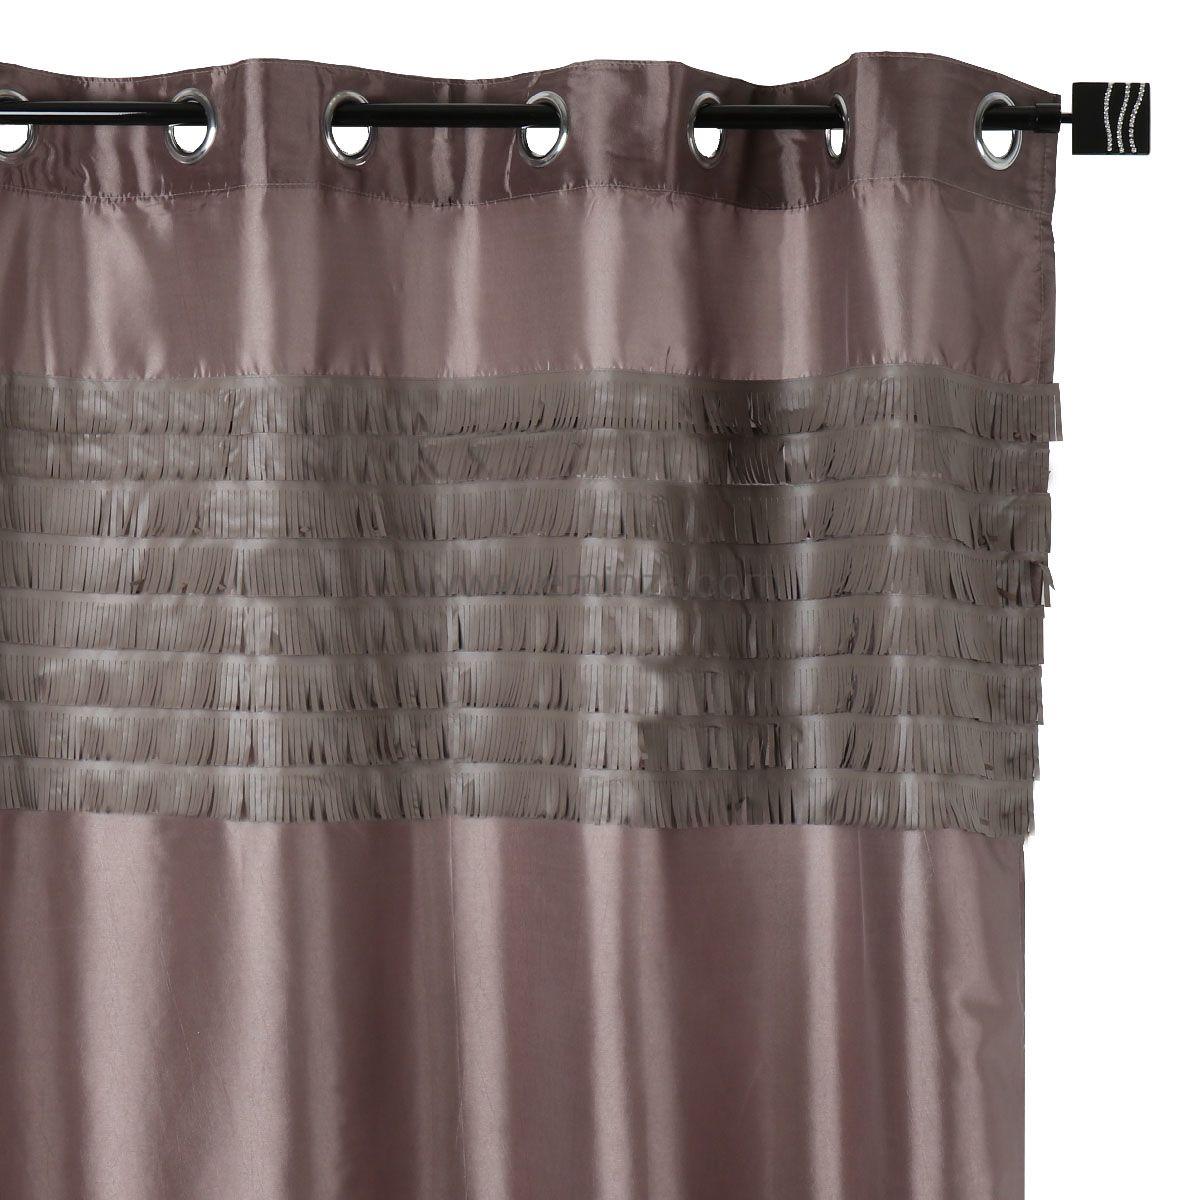 rideau 140 x h240 cm franges taupe rideau tamisant. Black Bedroom Furniture Sets. Home Design Ideas